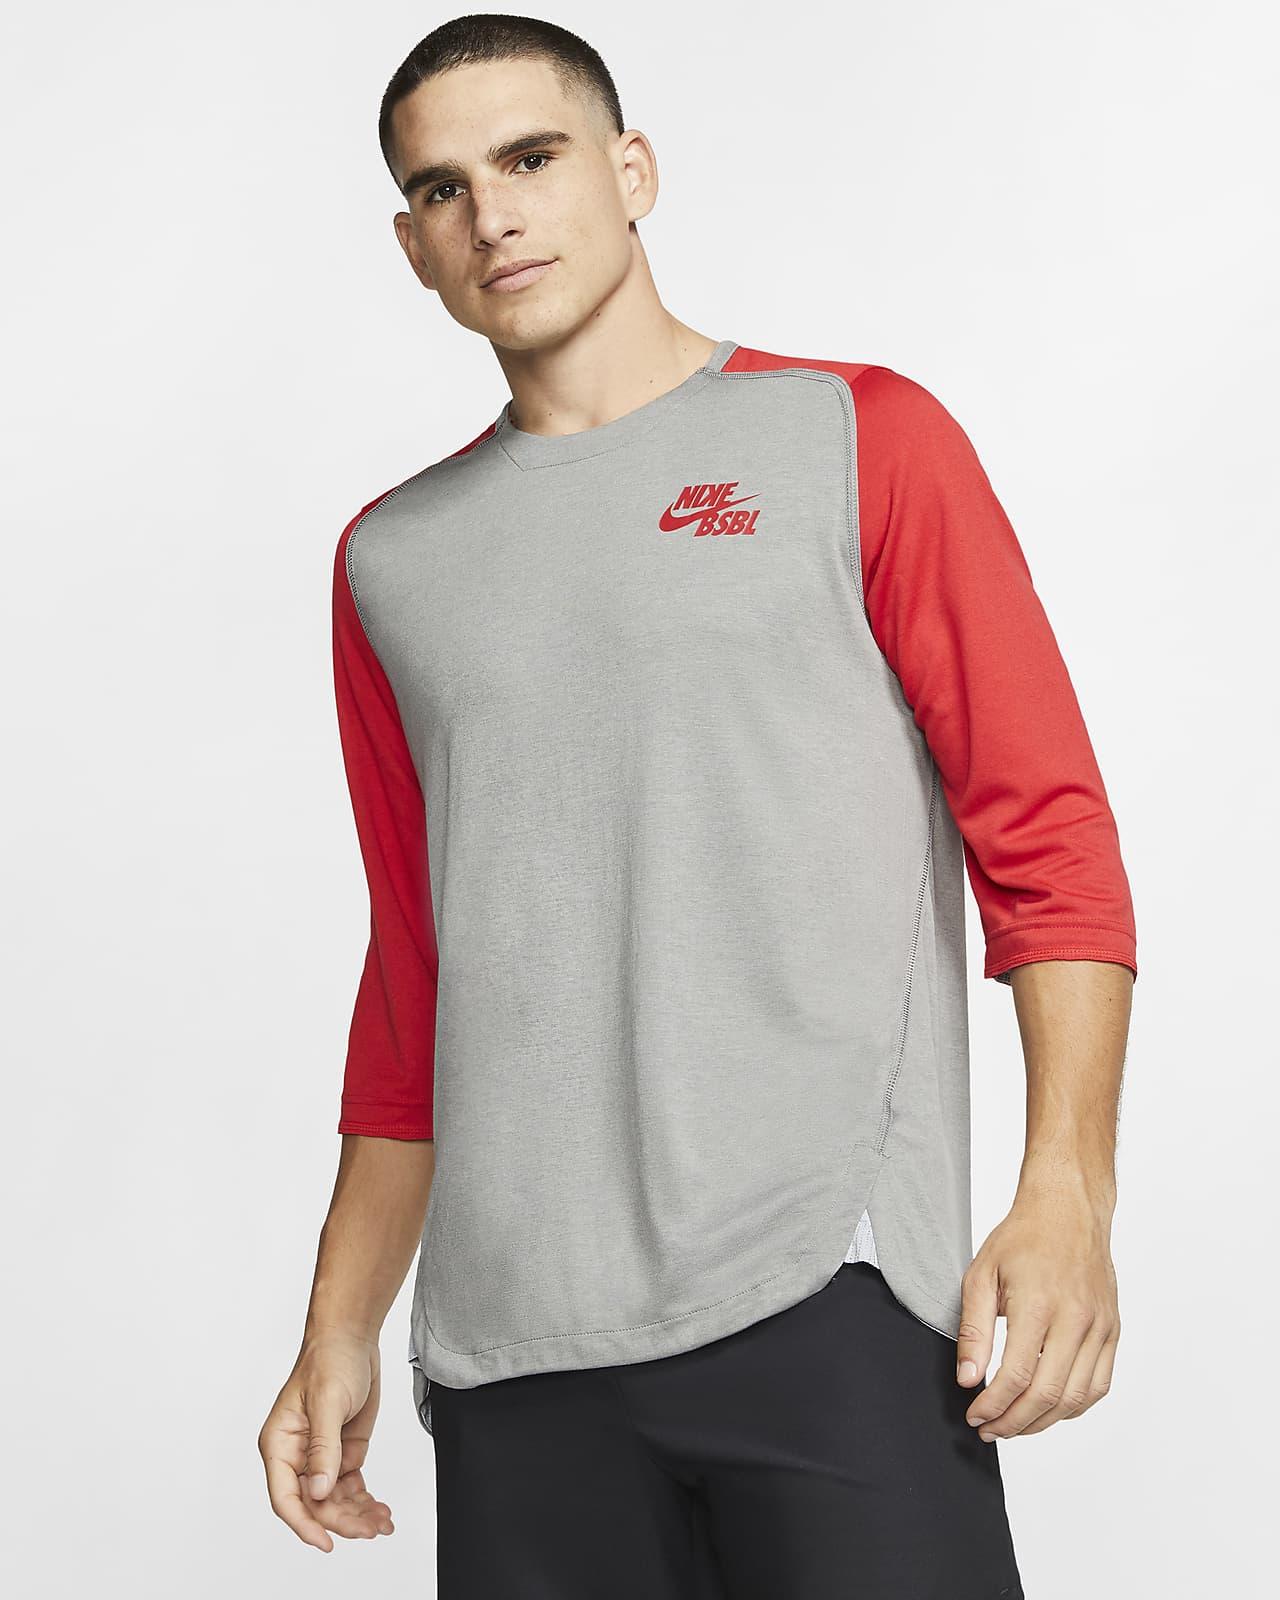 Mejora precoz Funeral  Nike Men's 3/4-Sleeve Baseball Top. Nike.com